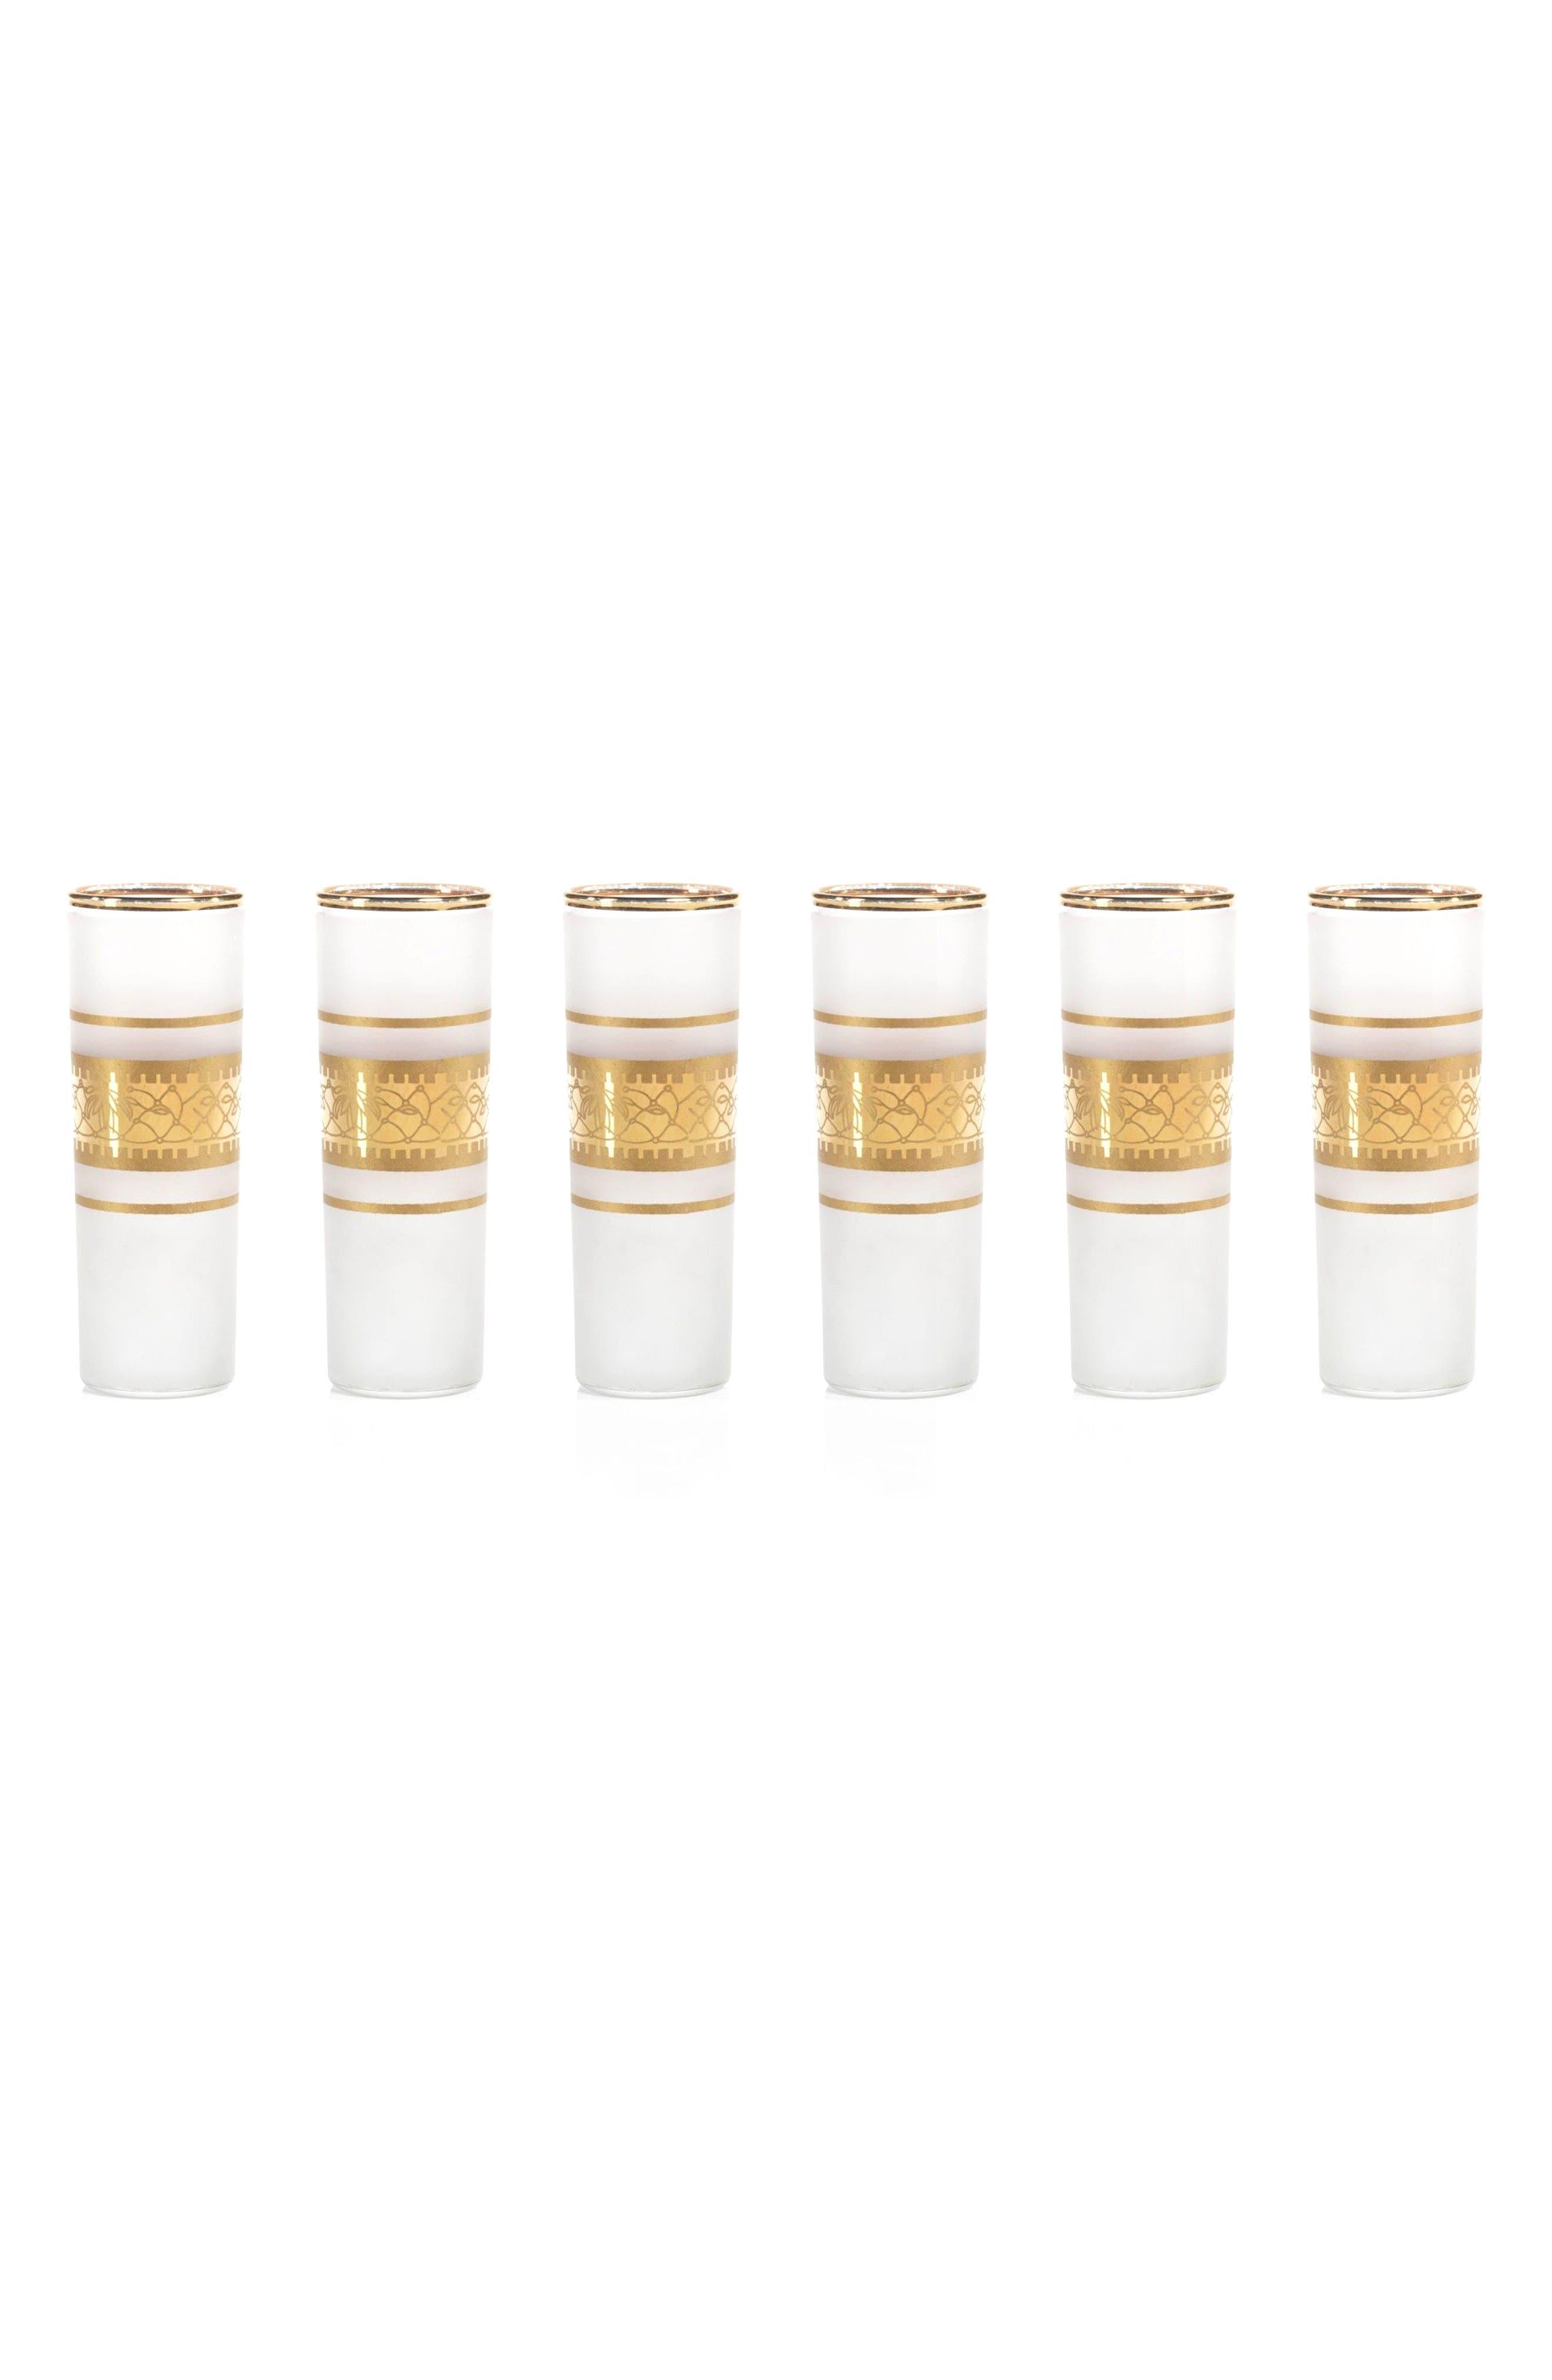 Alternate Image 1 Selected - Zodax Melilla Set of 6 Shot Glasses